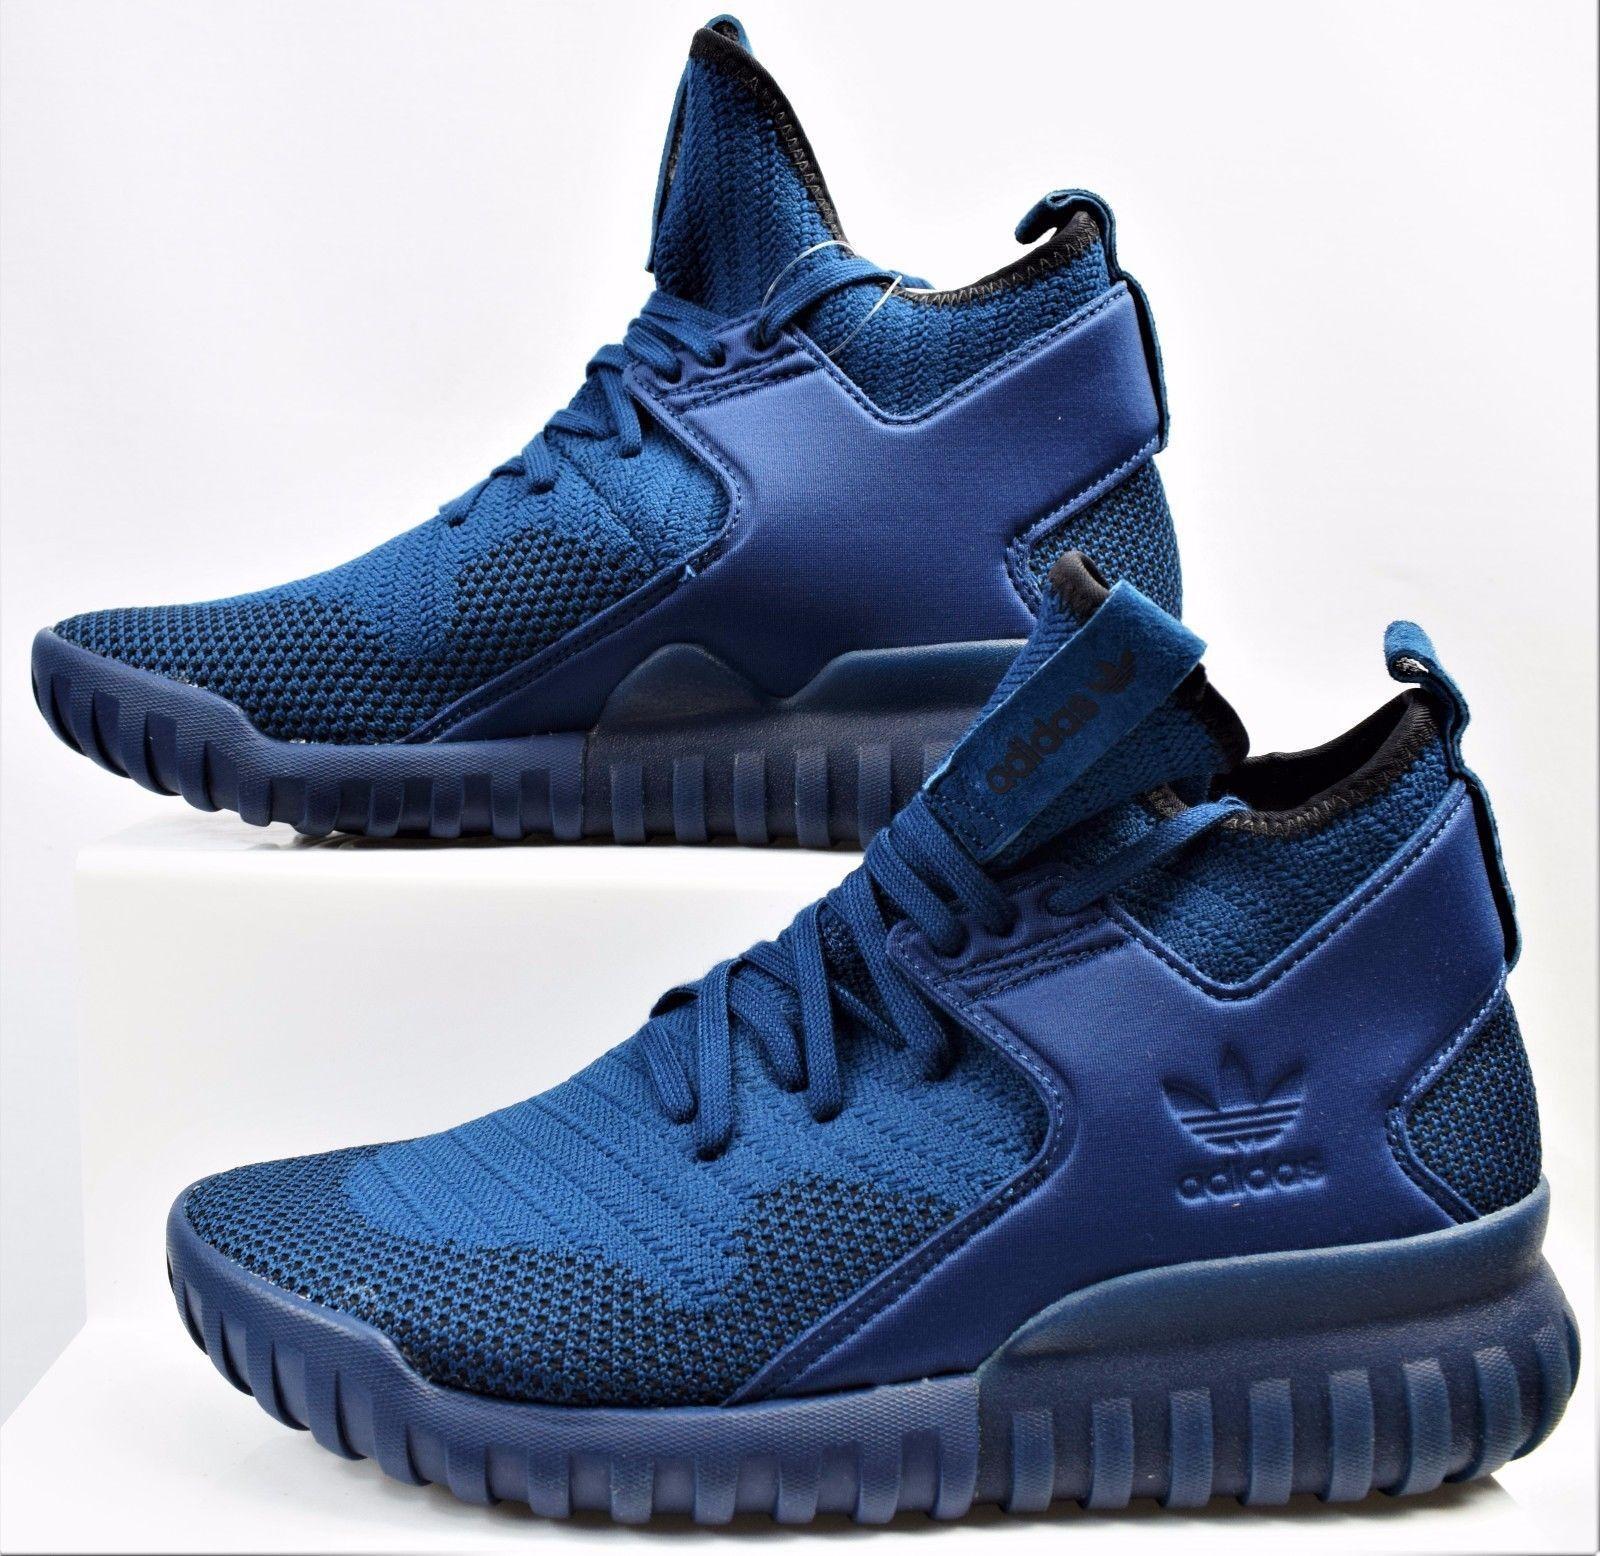 Adidas Hommes Originals Tubular Runner Wo Hommes Adidas Running Trainers S78933 Baskets Chaussures a10023